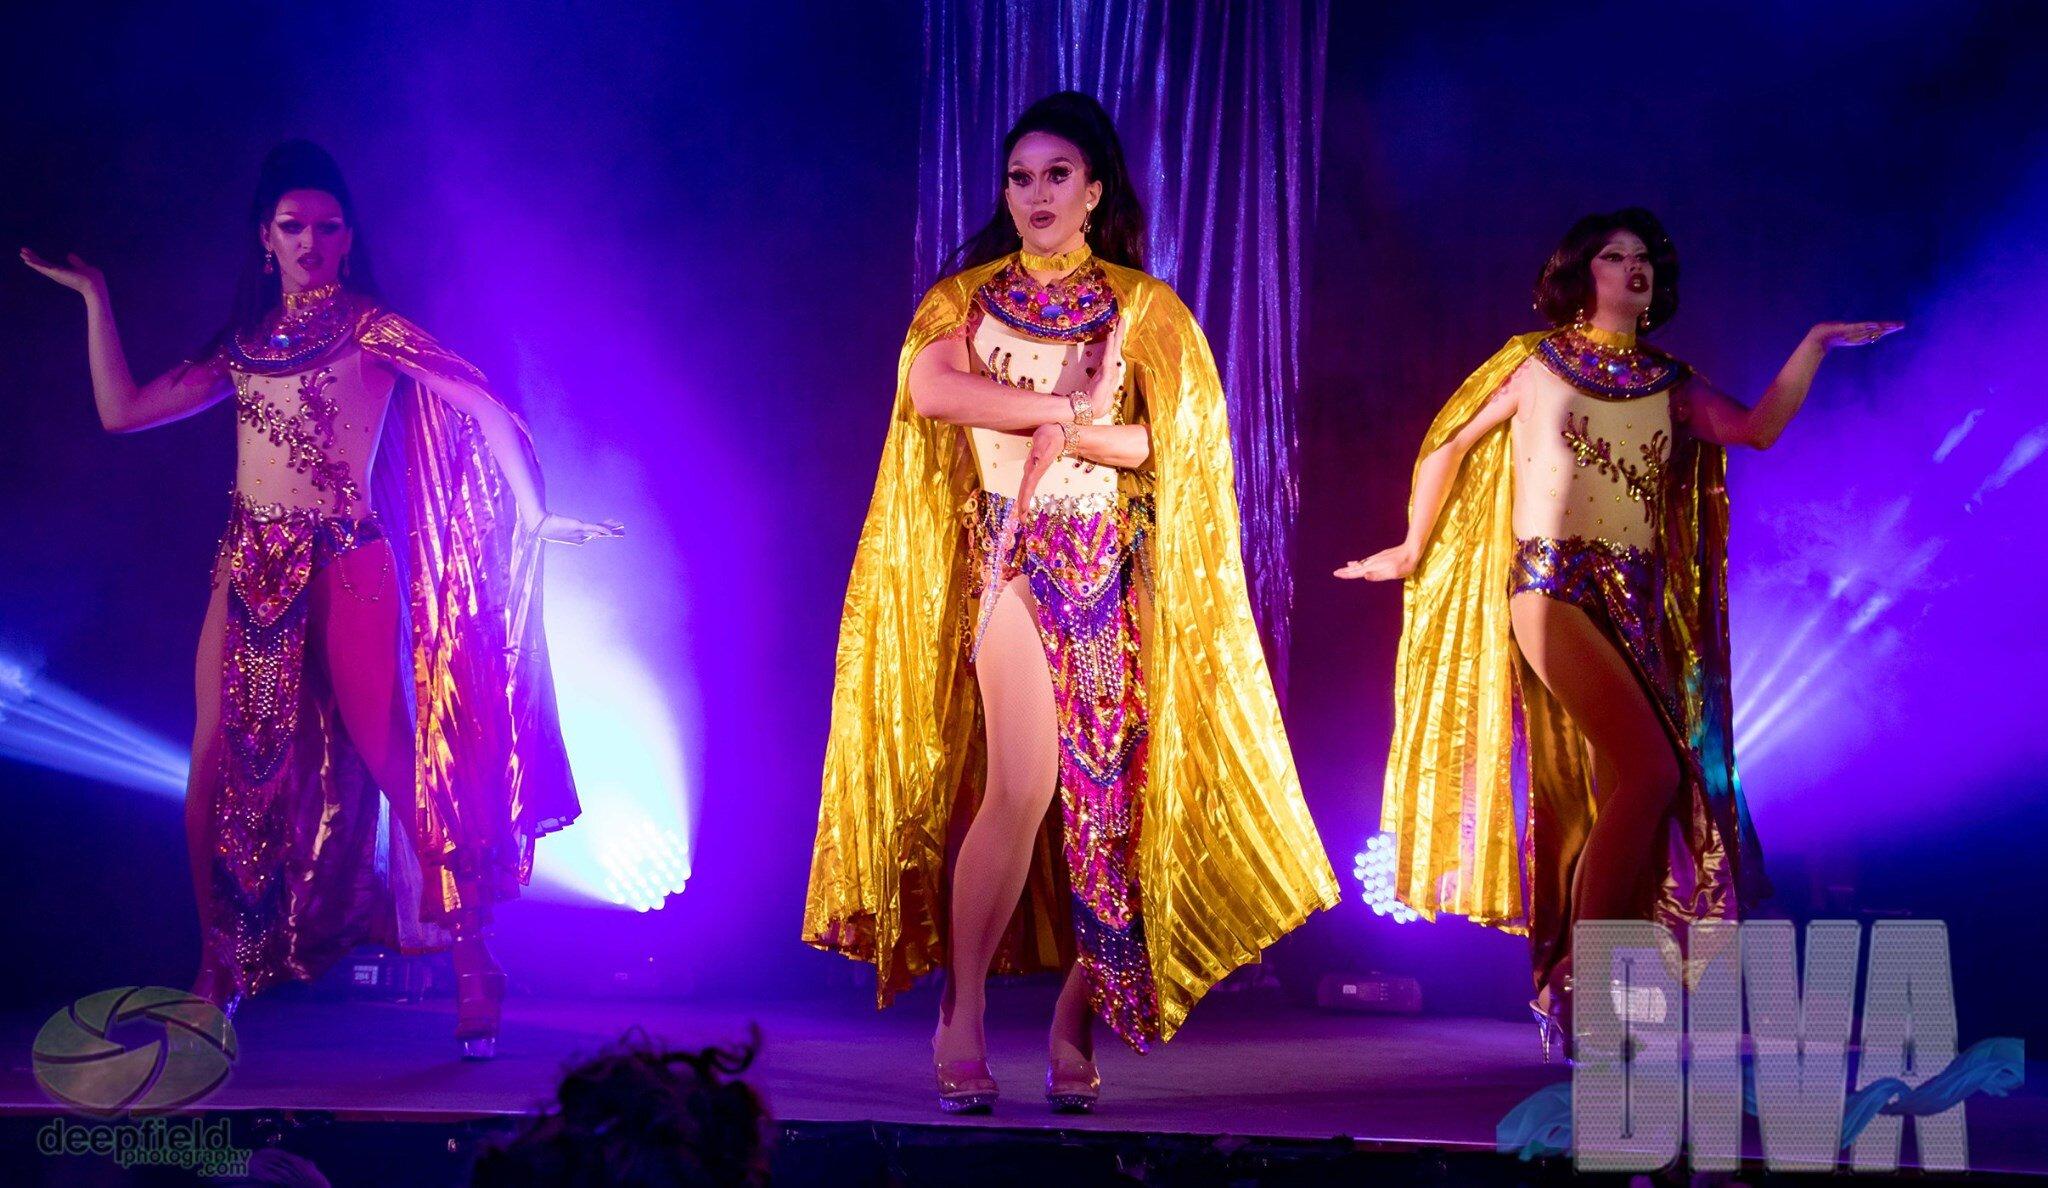 slay-2-stay-danni-issues-mynx-moscato-show-entertainment-diva-awards-sydney-drag-queen-royalty-best-hire-drag-race-australia-1.jpg